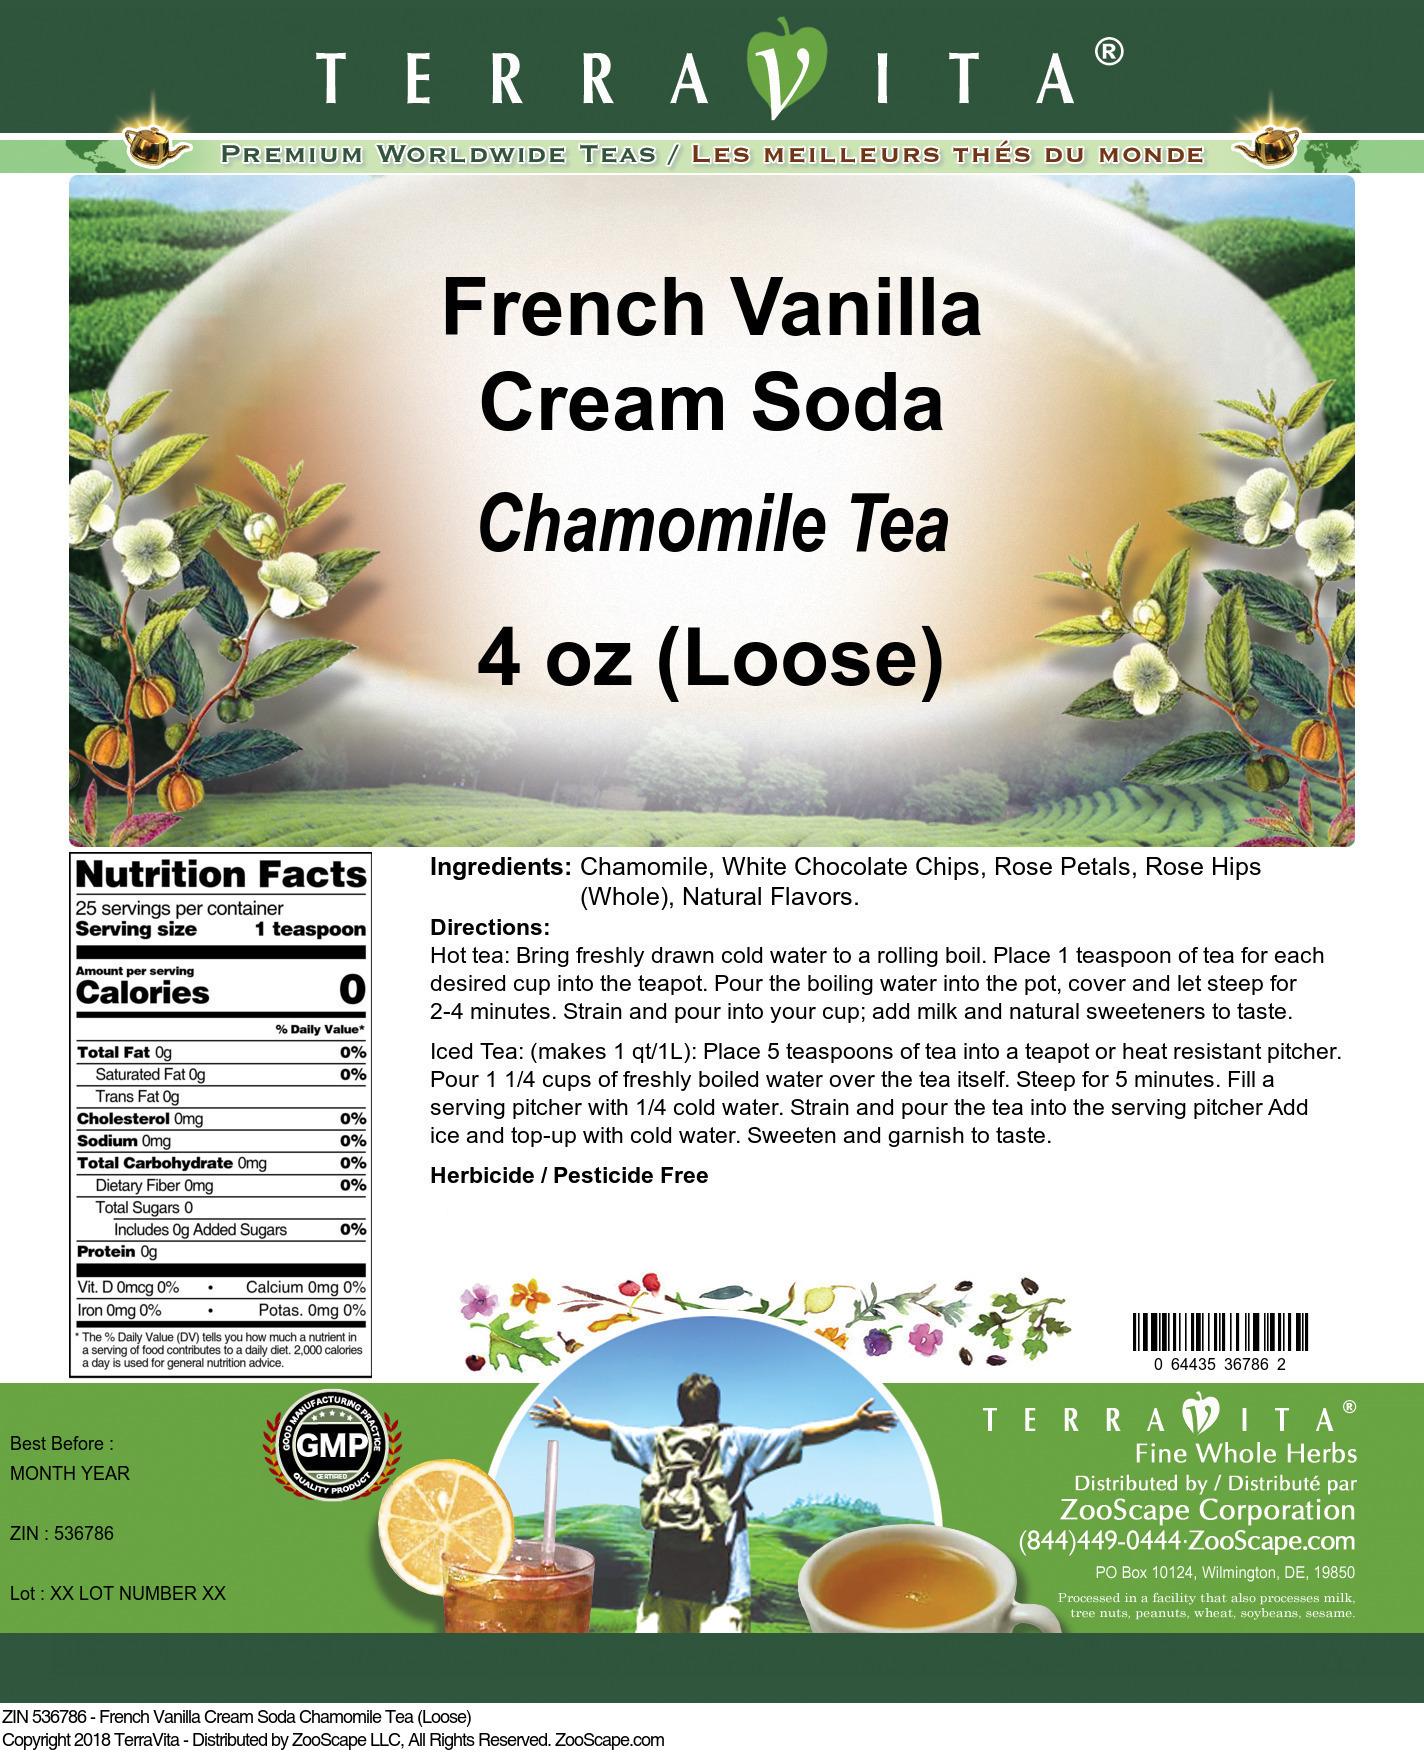 French Vanilla Cream Soda Chamomile Tea